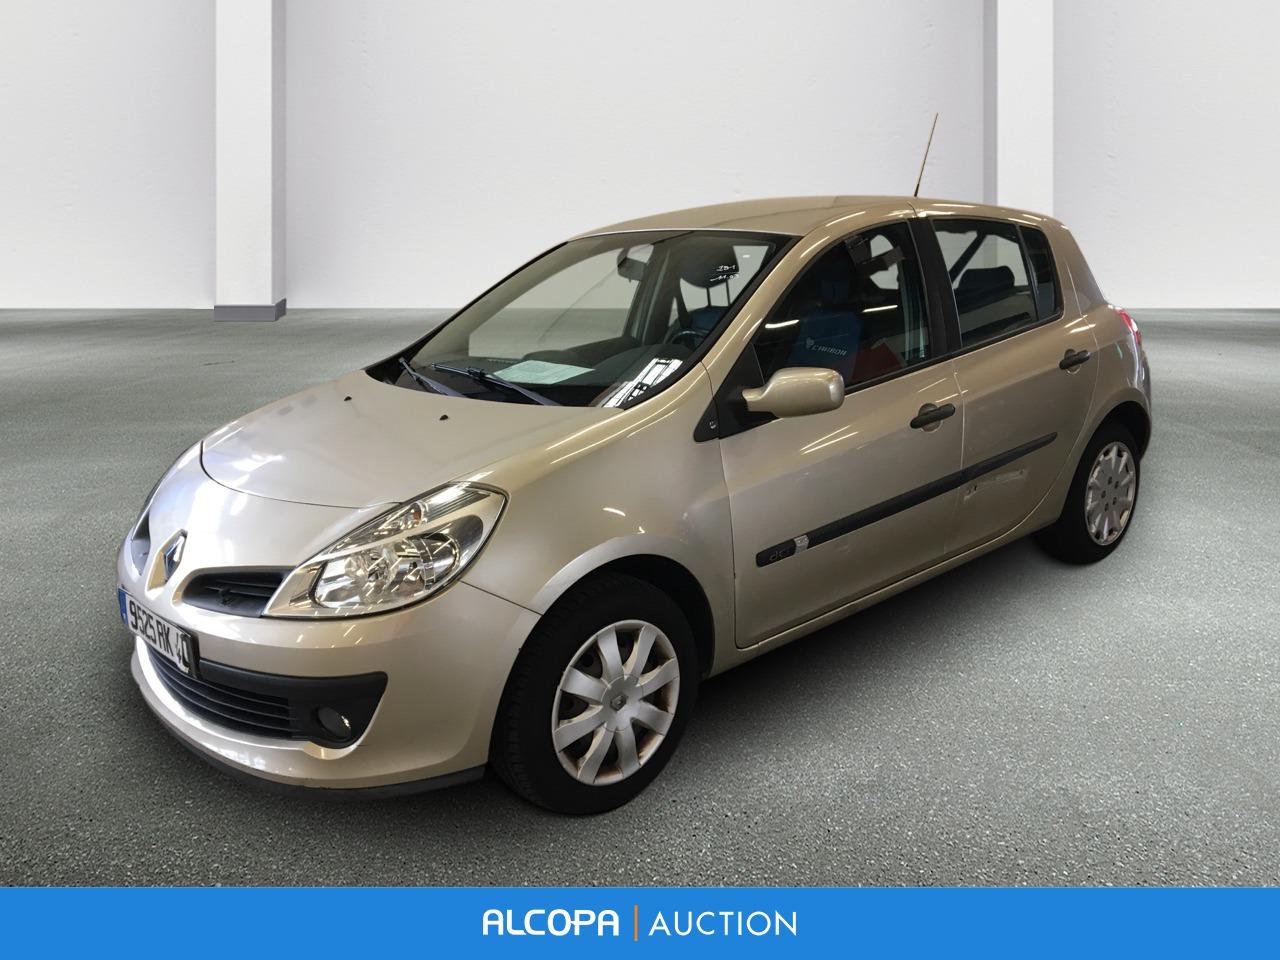 Renault Clio Iii  08  2005-04  2009